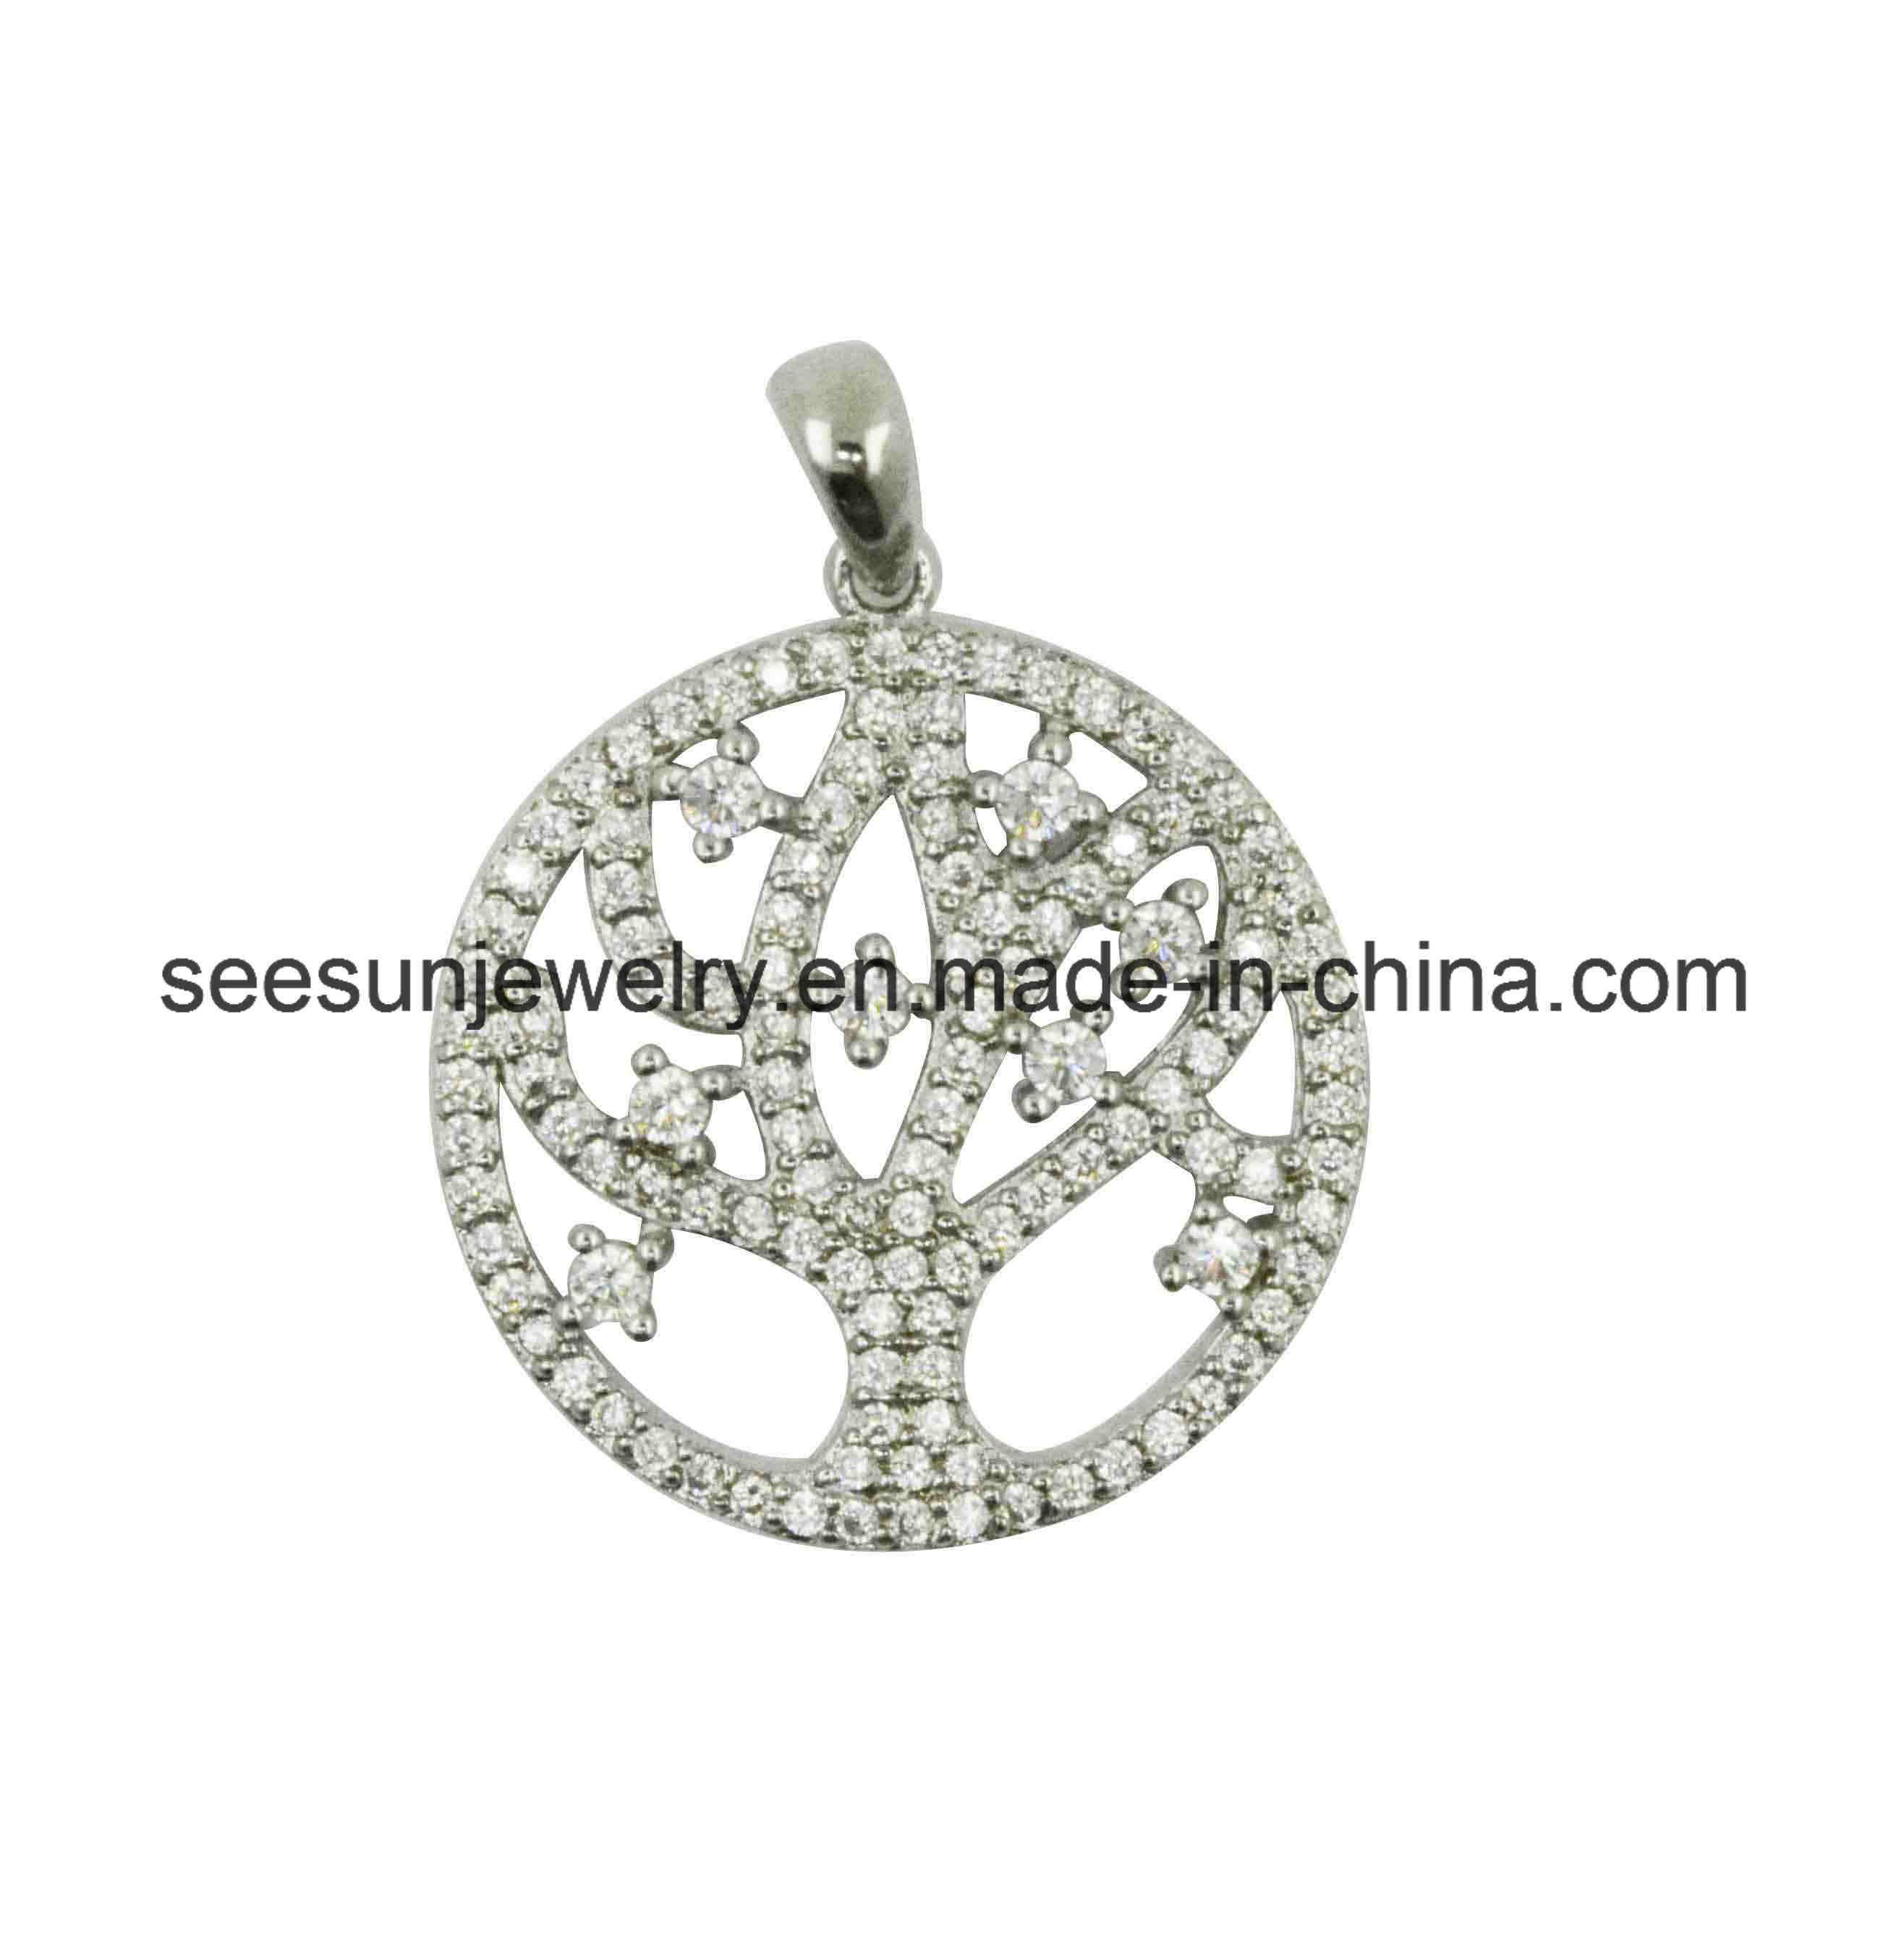 2016 Fashion Silver Jewelry Life of Tree Pendant